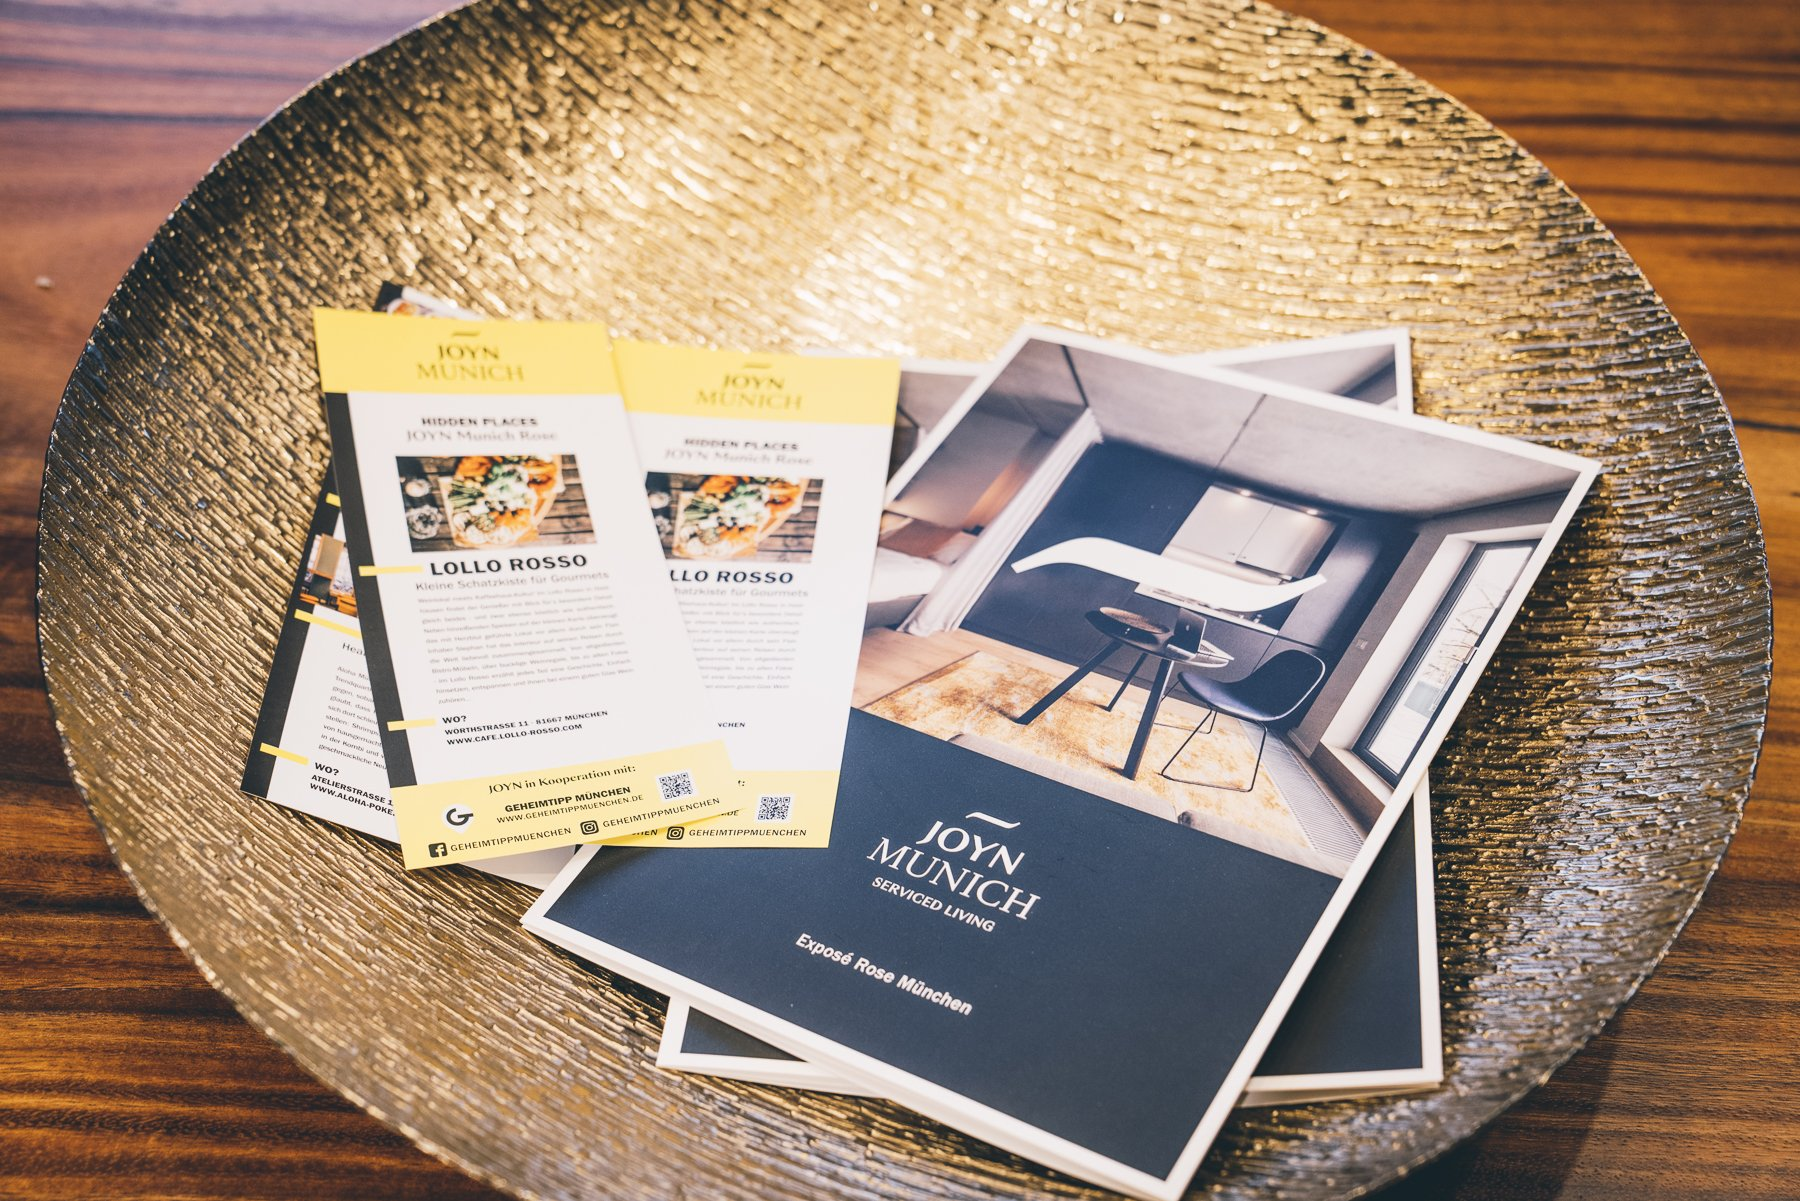 Geheimtipp Muenchen Hotel Joyn Apartments2 – ©wunderland media GmbH